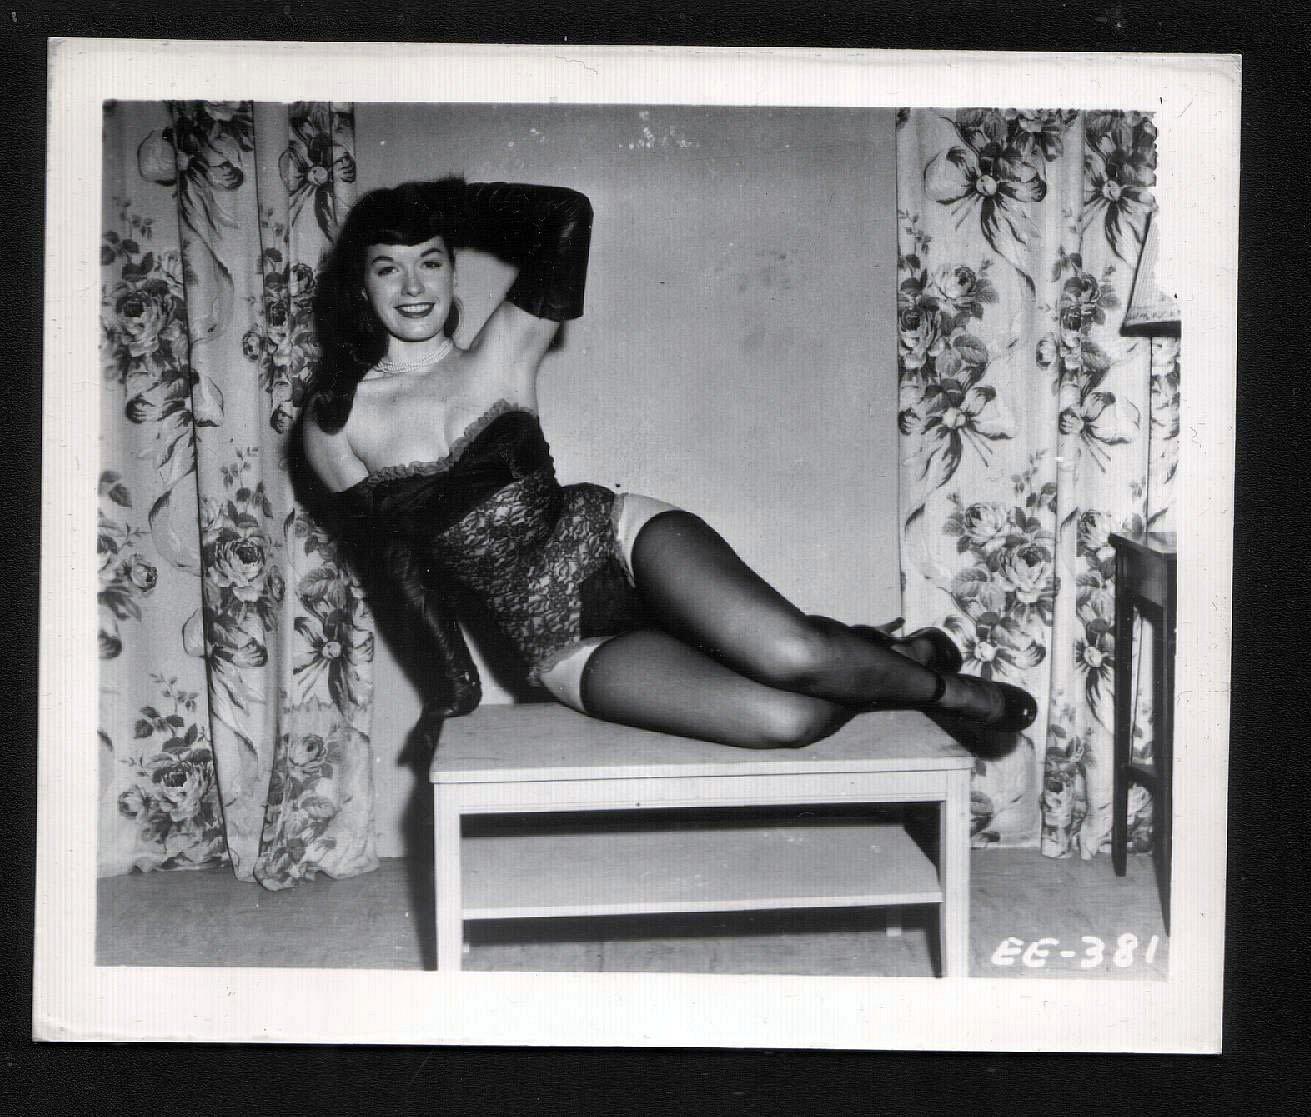 betty page hot hot pose vintage irving klaw photo 4x5 ee. Black Bedroom Furniture Sets. Home Design Ideas